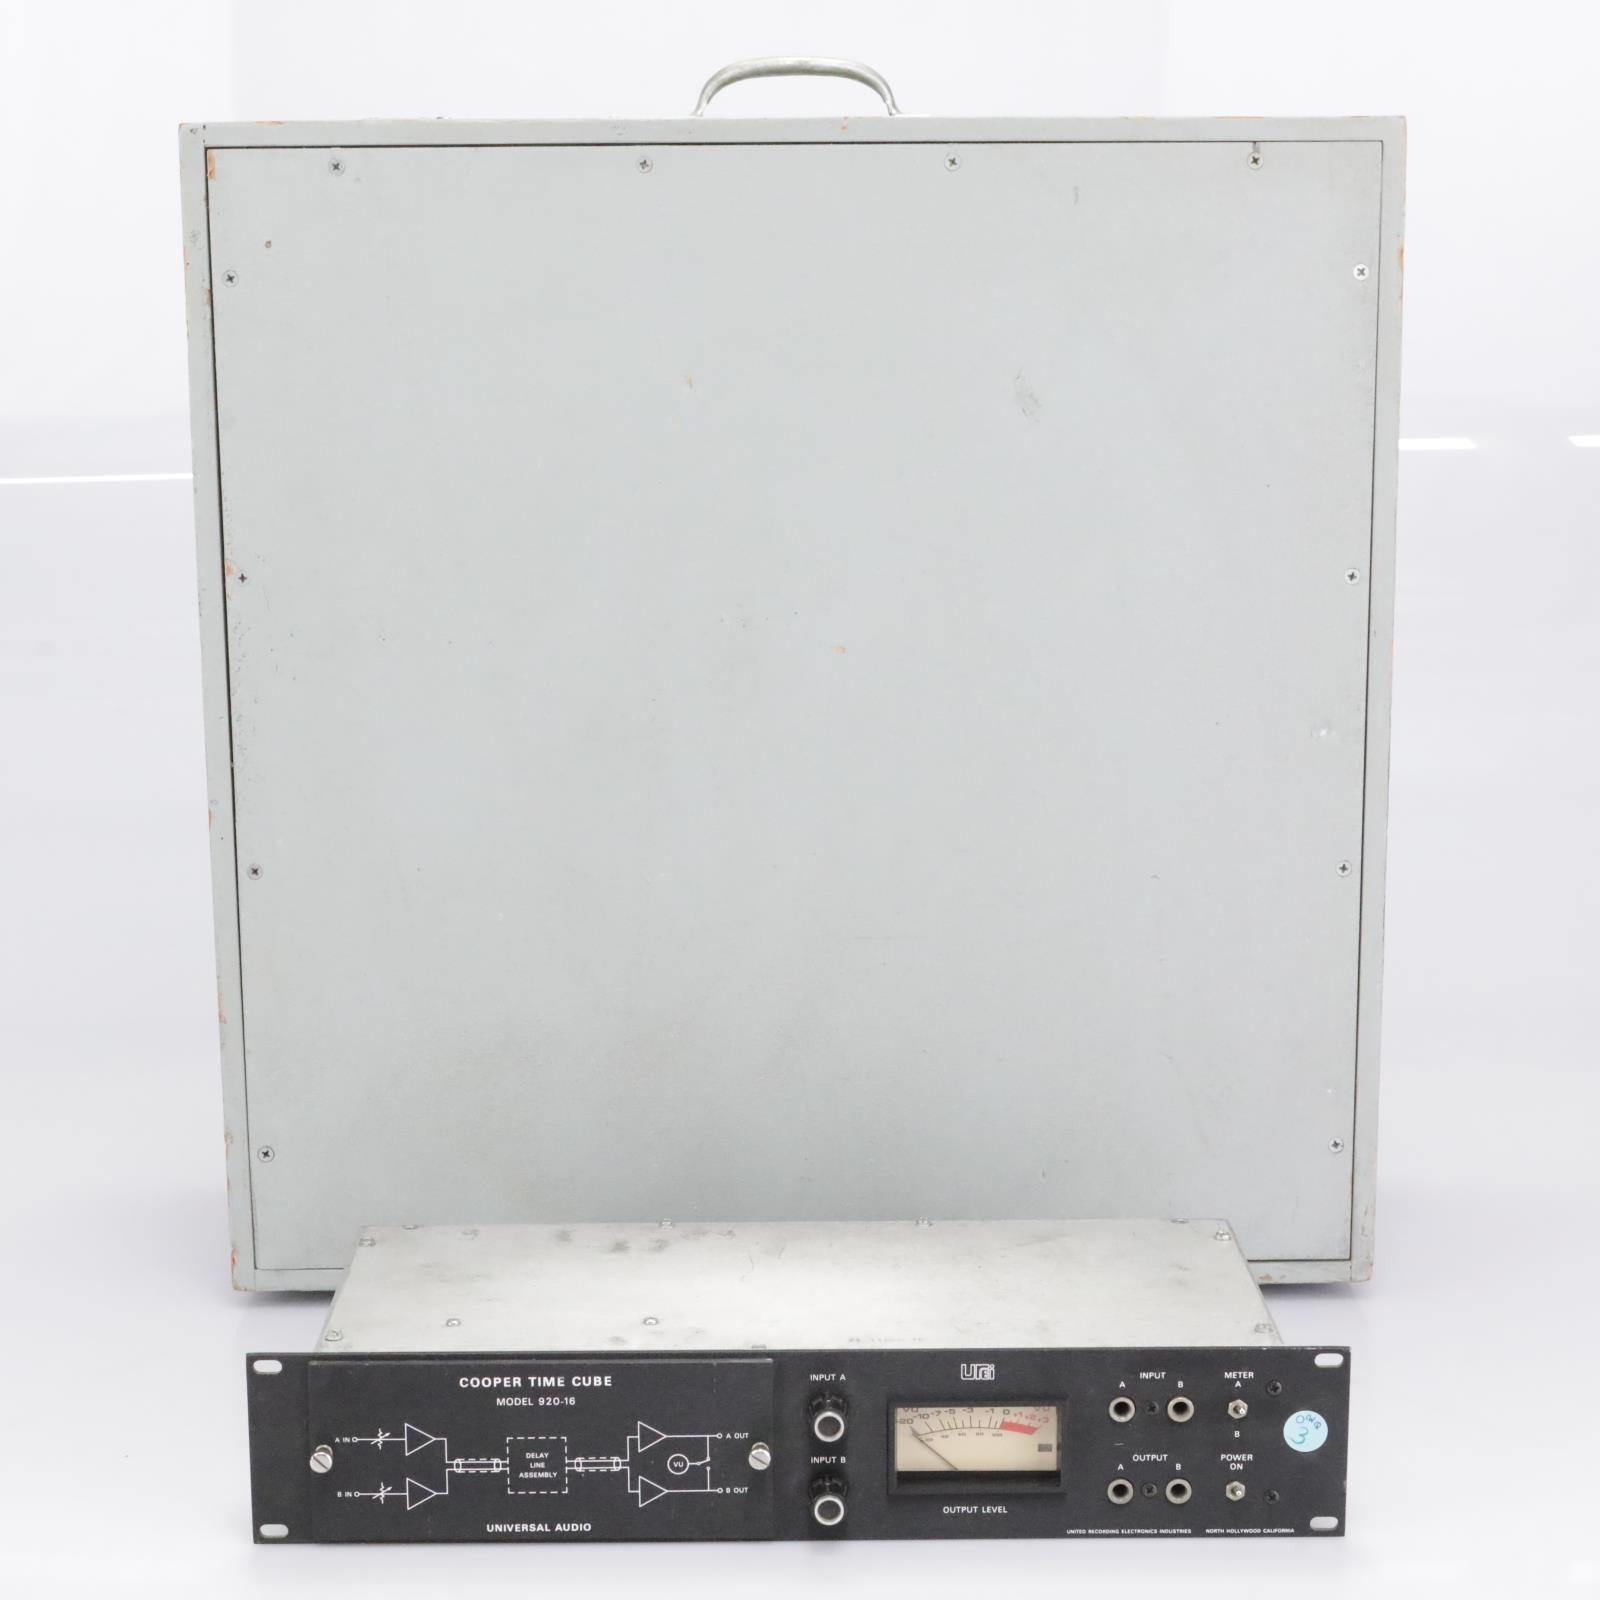 Universal Audio Urei Model 920-16 Cooper Time Cube #30278